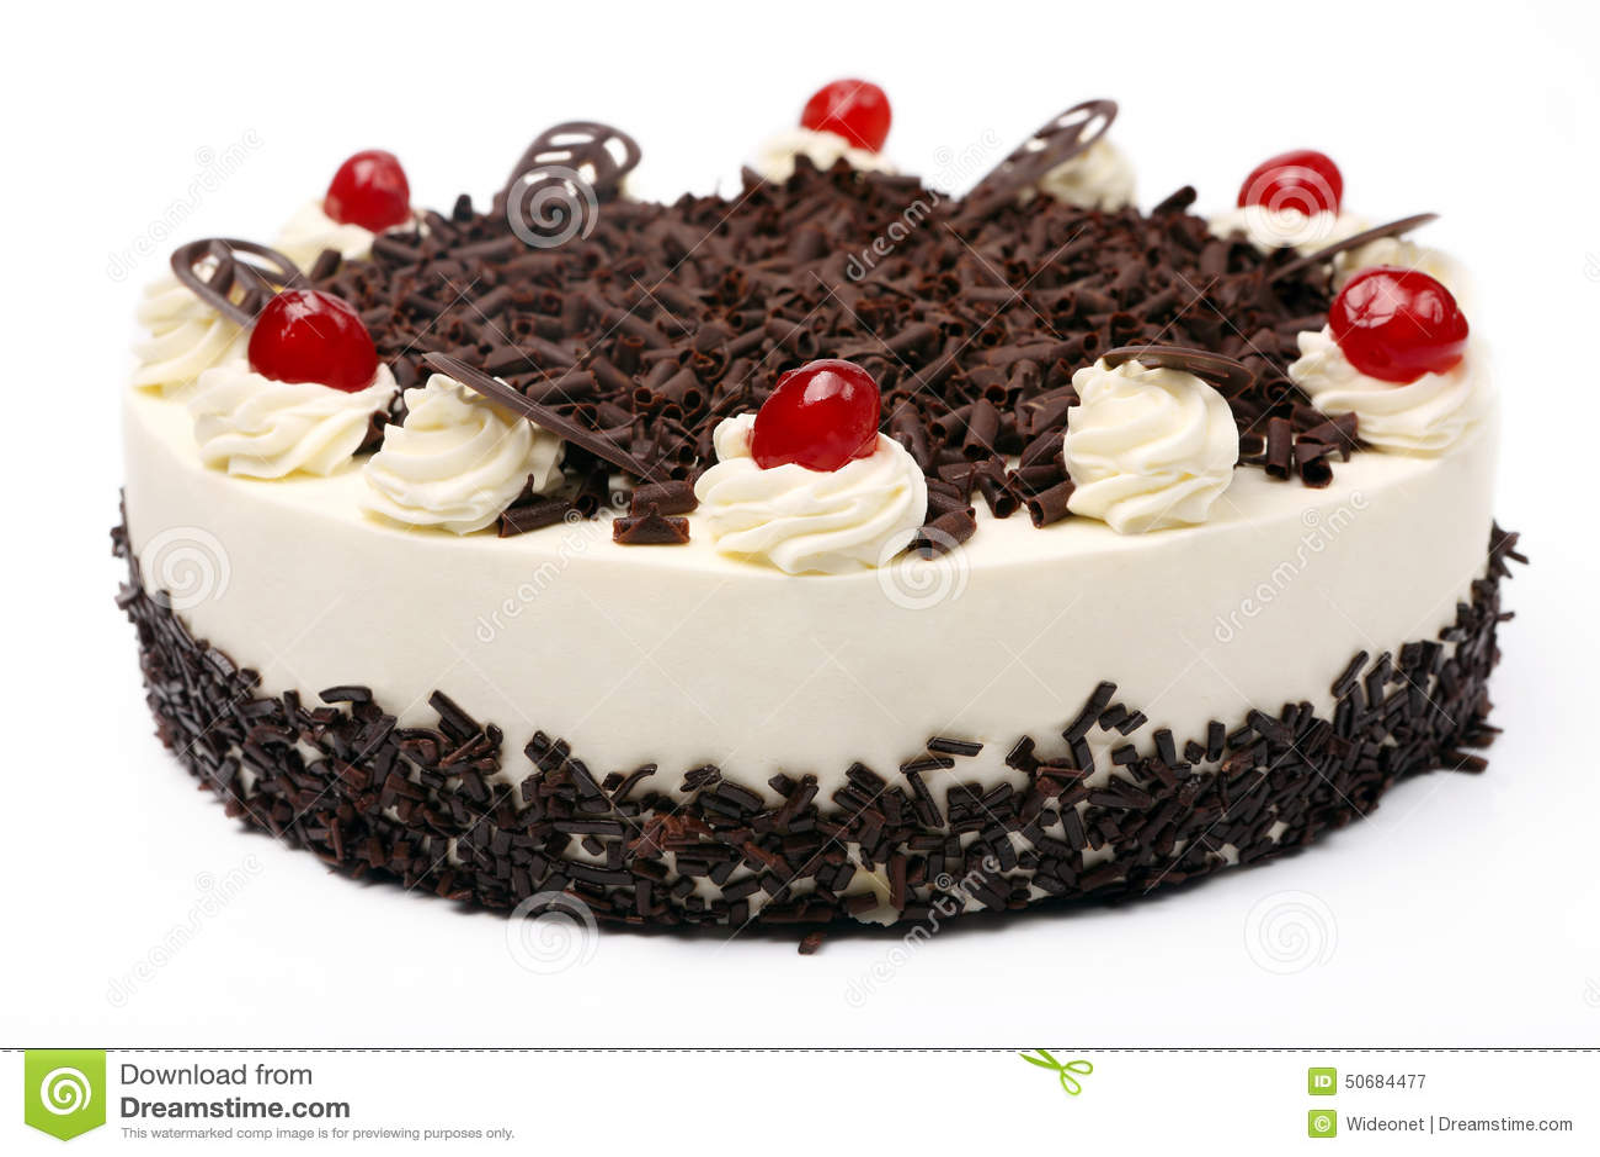 Triangle Birthday Cake